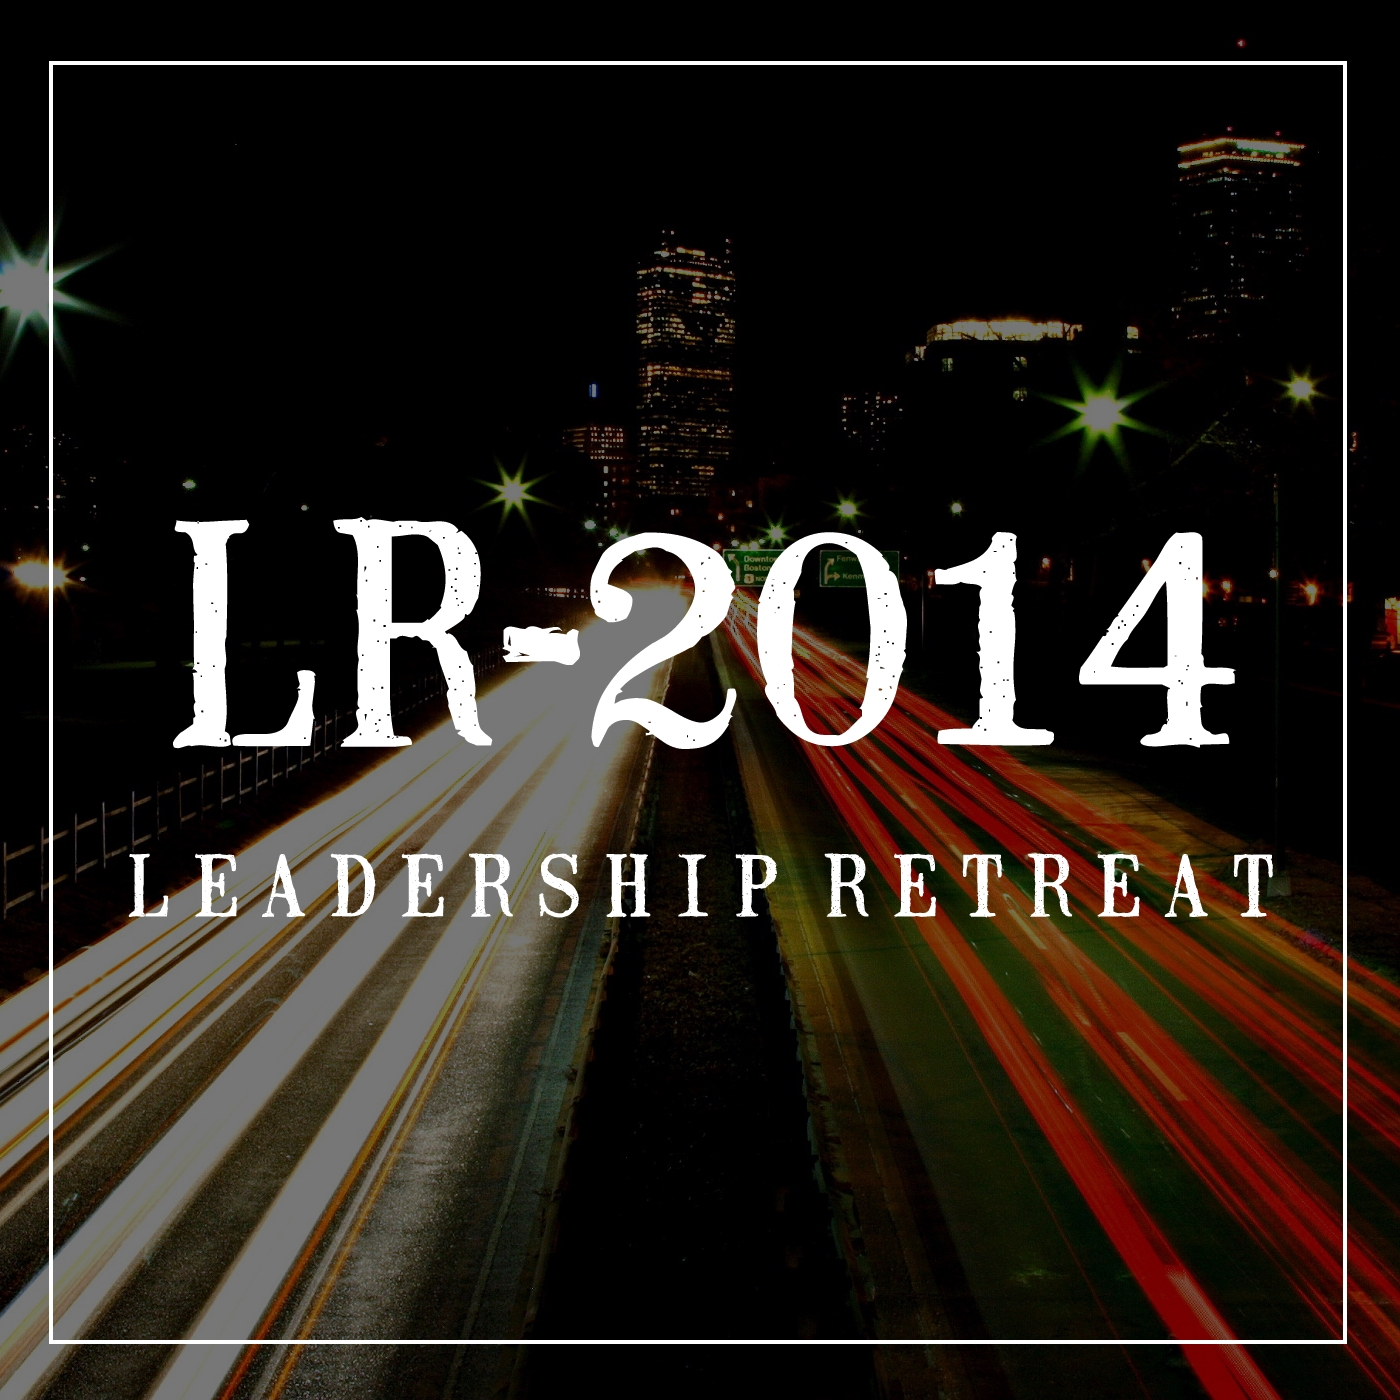 Leadership Retreat January 2014: The Core Principles of LifeSong Church